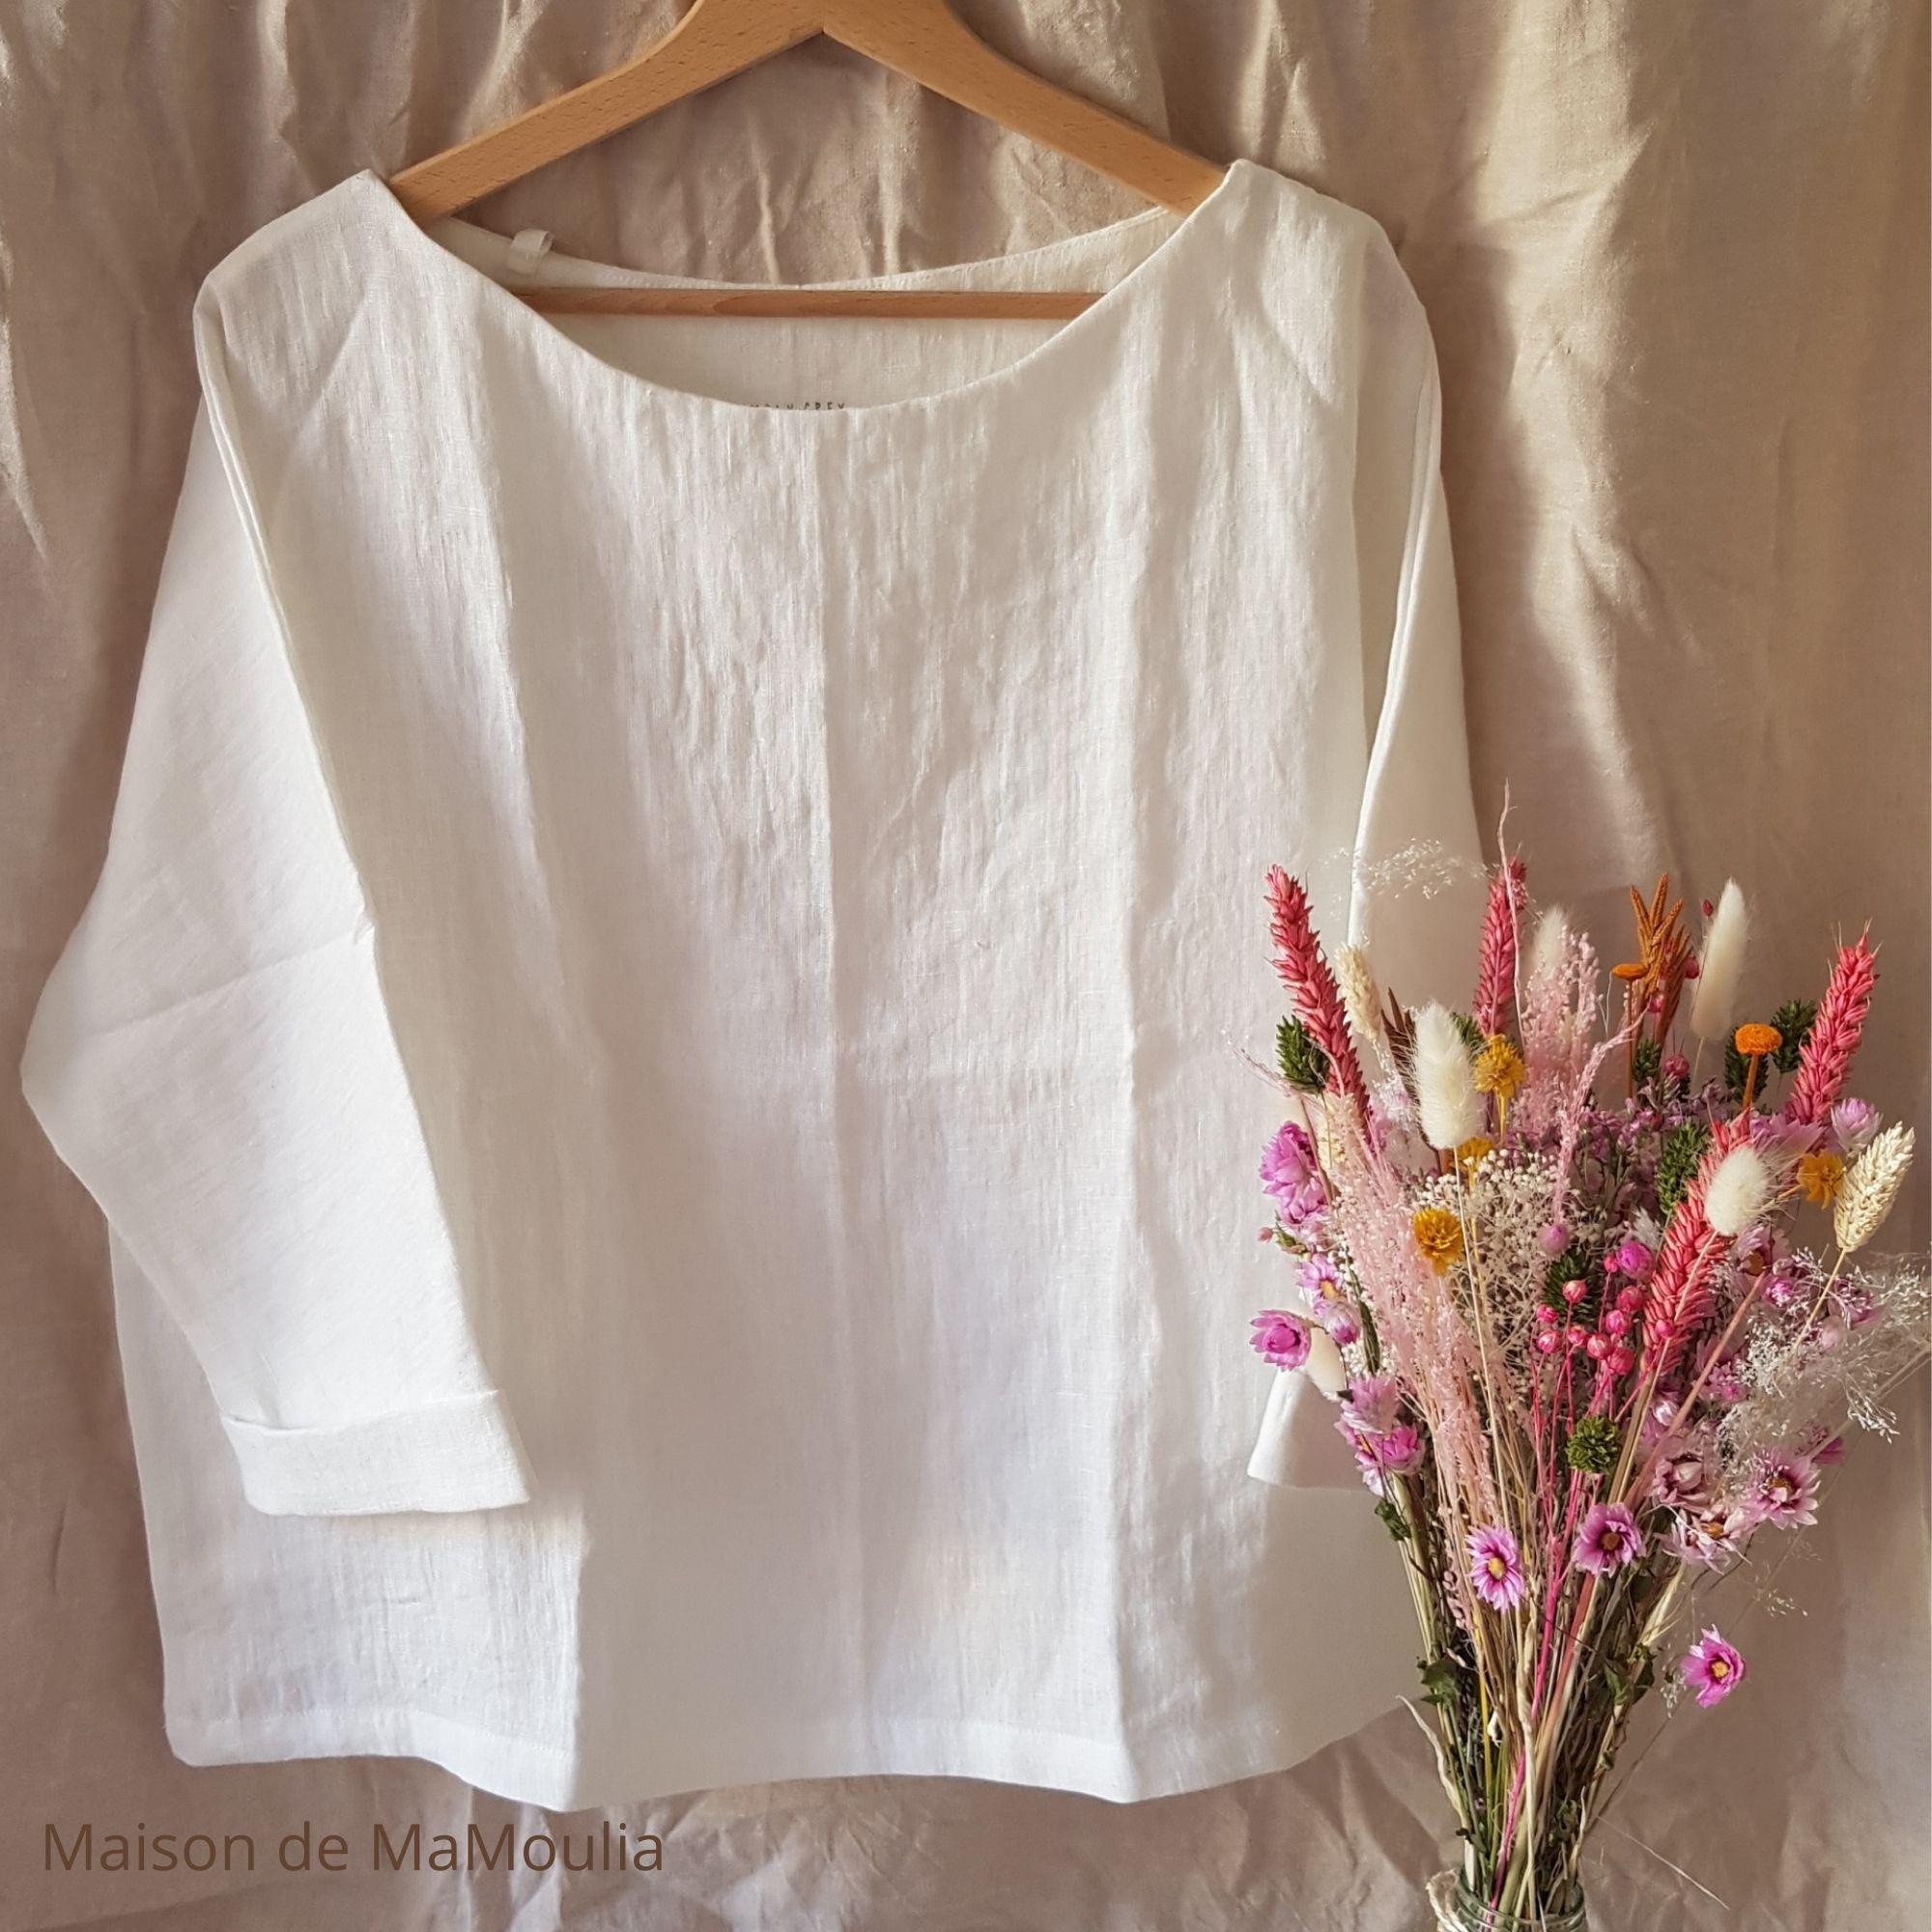 chemise-blouse-femme-pure-lin-lave-simplygrey-maison-de-mamoulia-blanche-offwhite